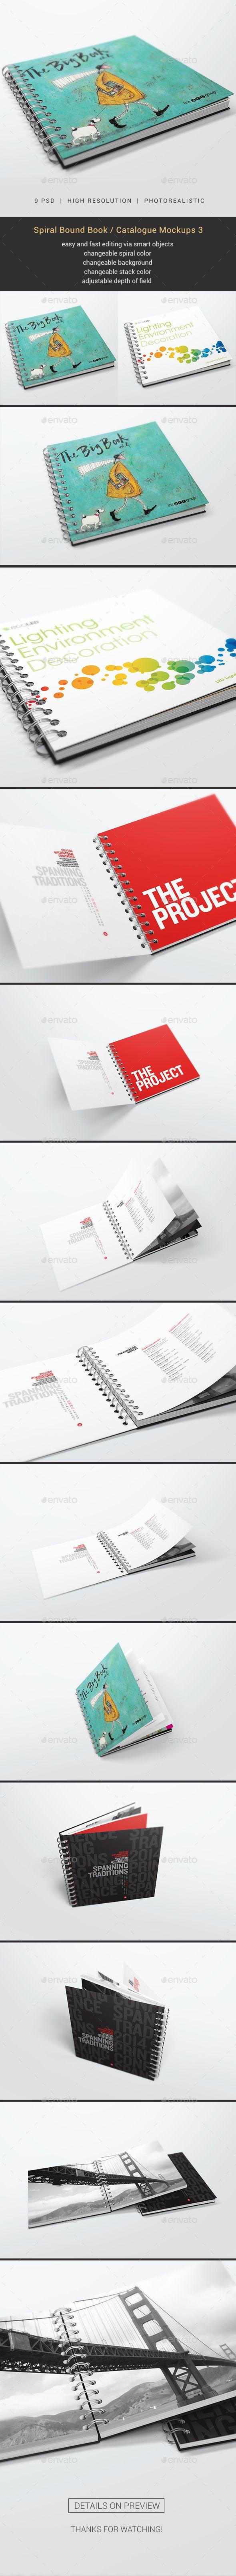 Spiral Bound Book / Catalogue Mockups 3